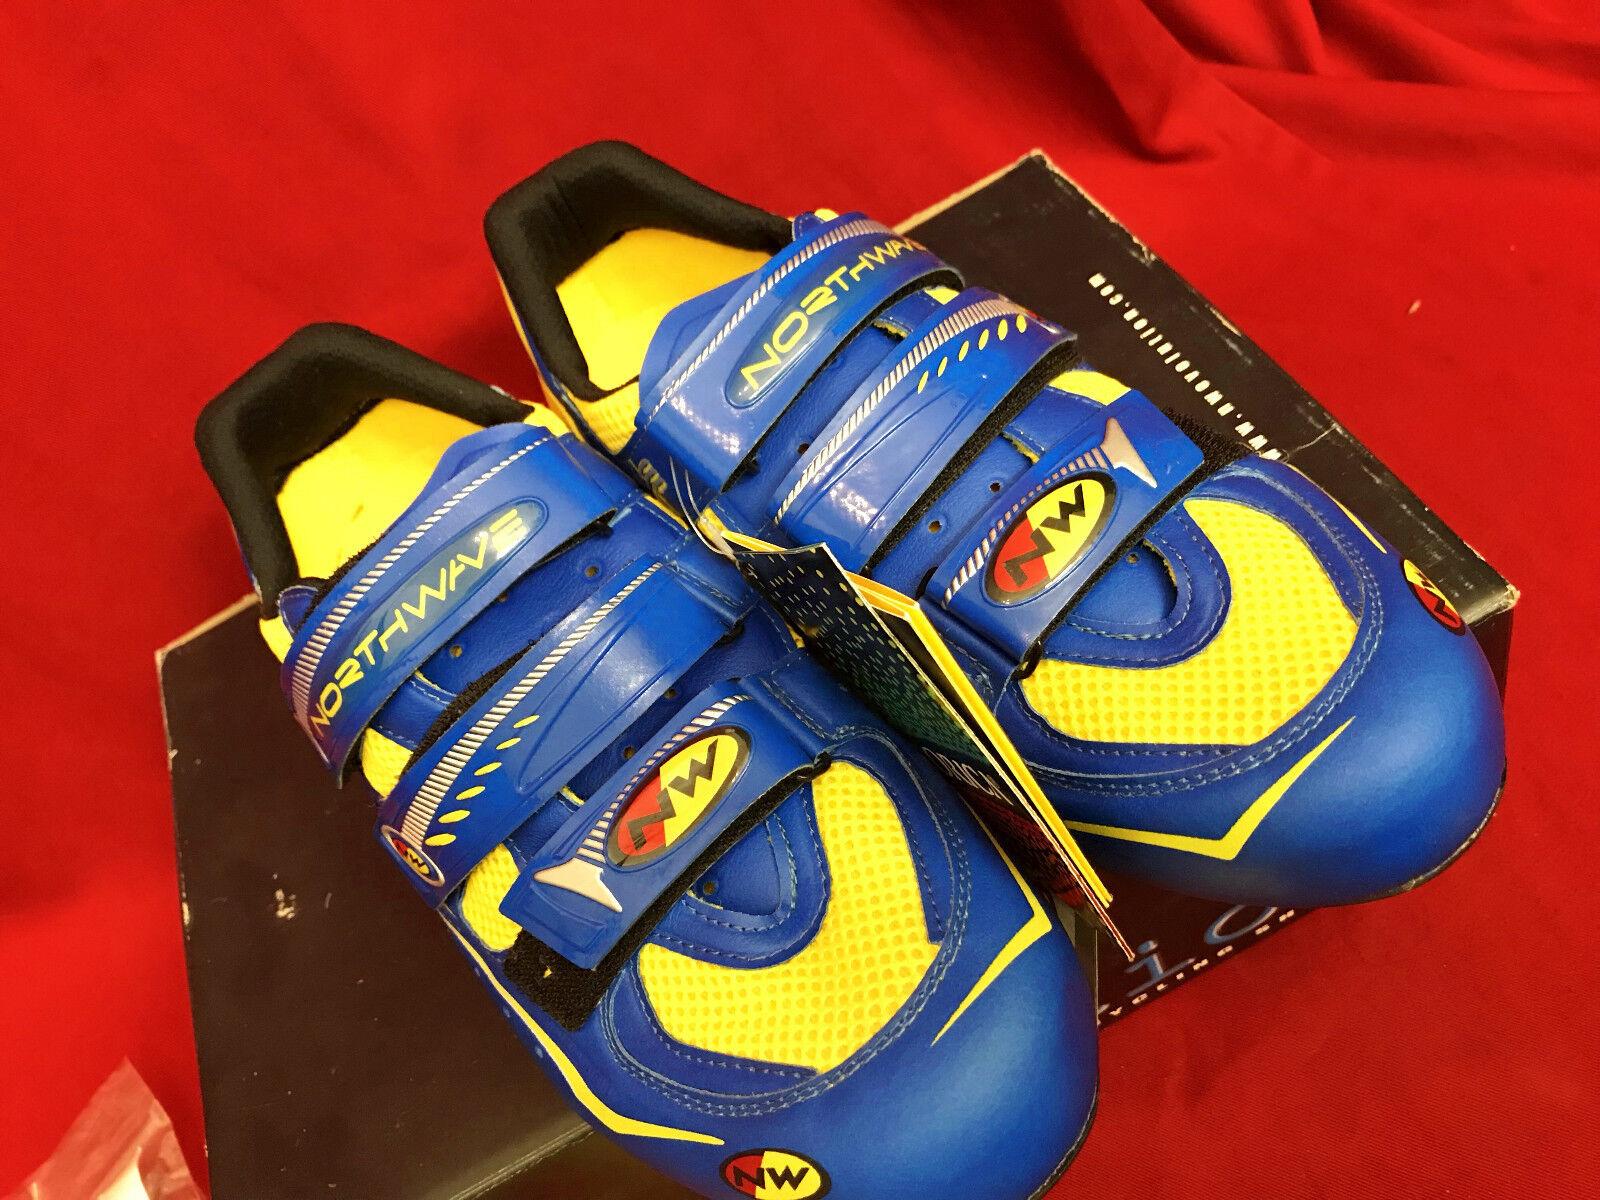 VINTAGE NOS northwave EVOLUTION 2000 race cycle shoes shoes 42.5 US10 28cm UK9